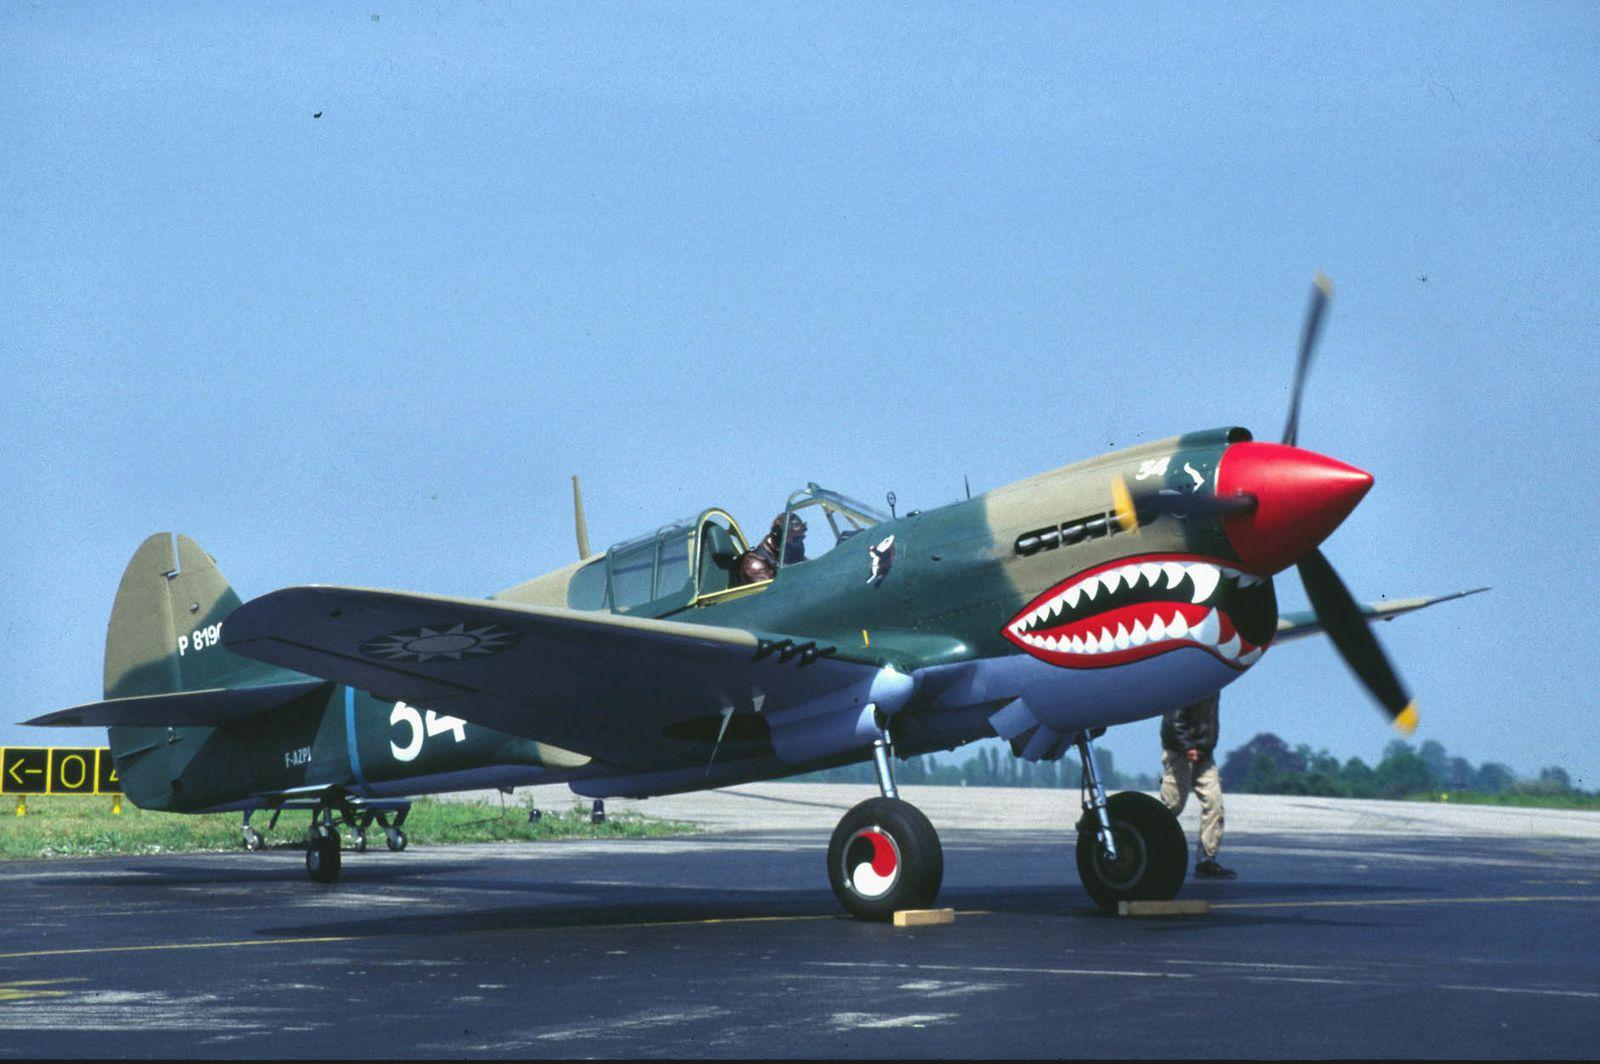 Le Curtiss P-40 F-AZPJ, vendu à l'étranger